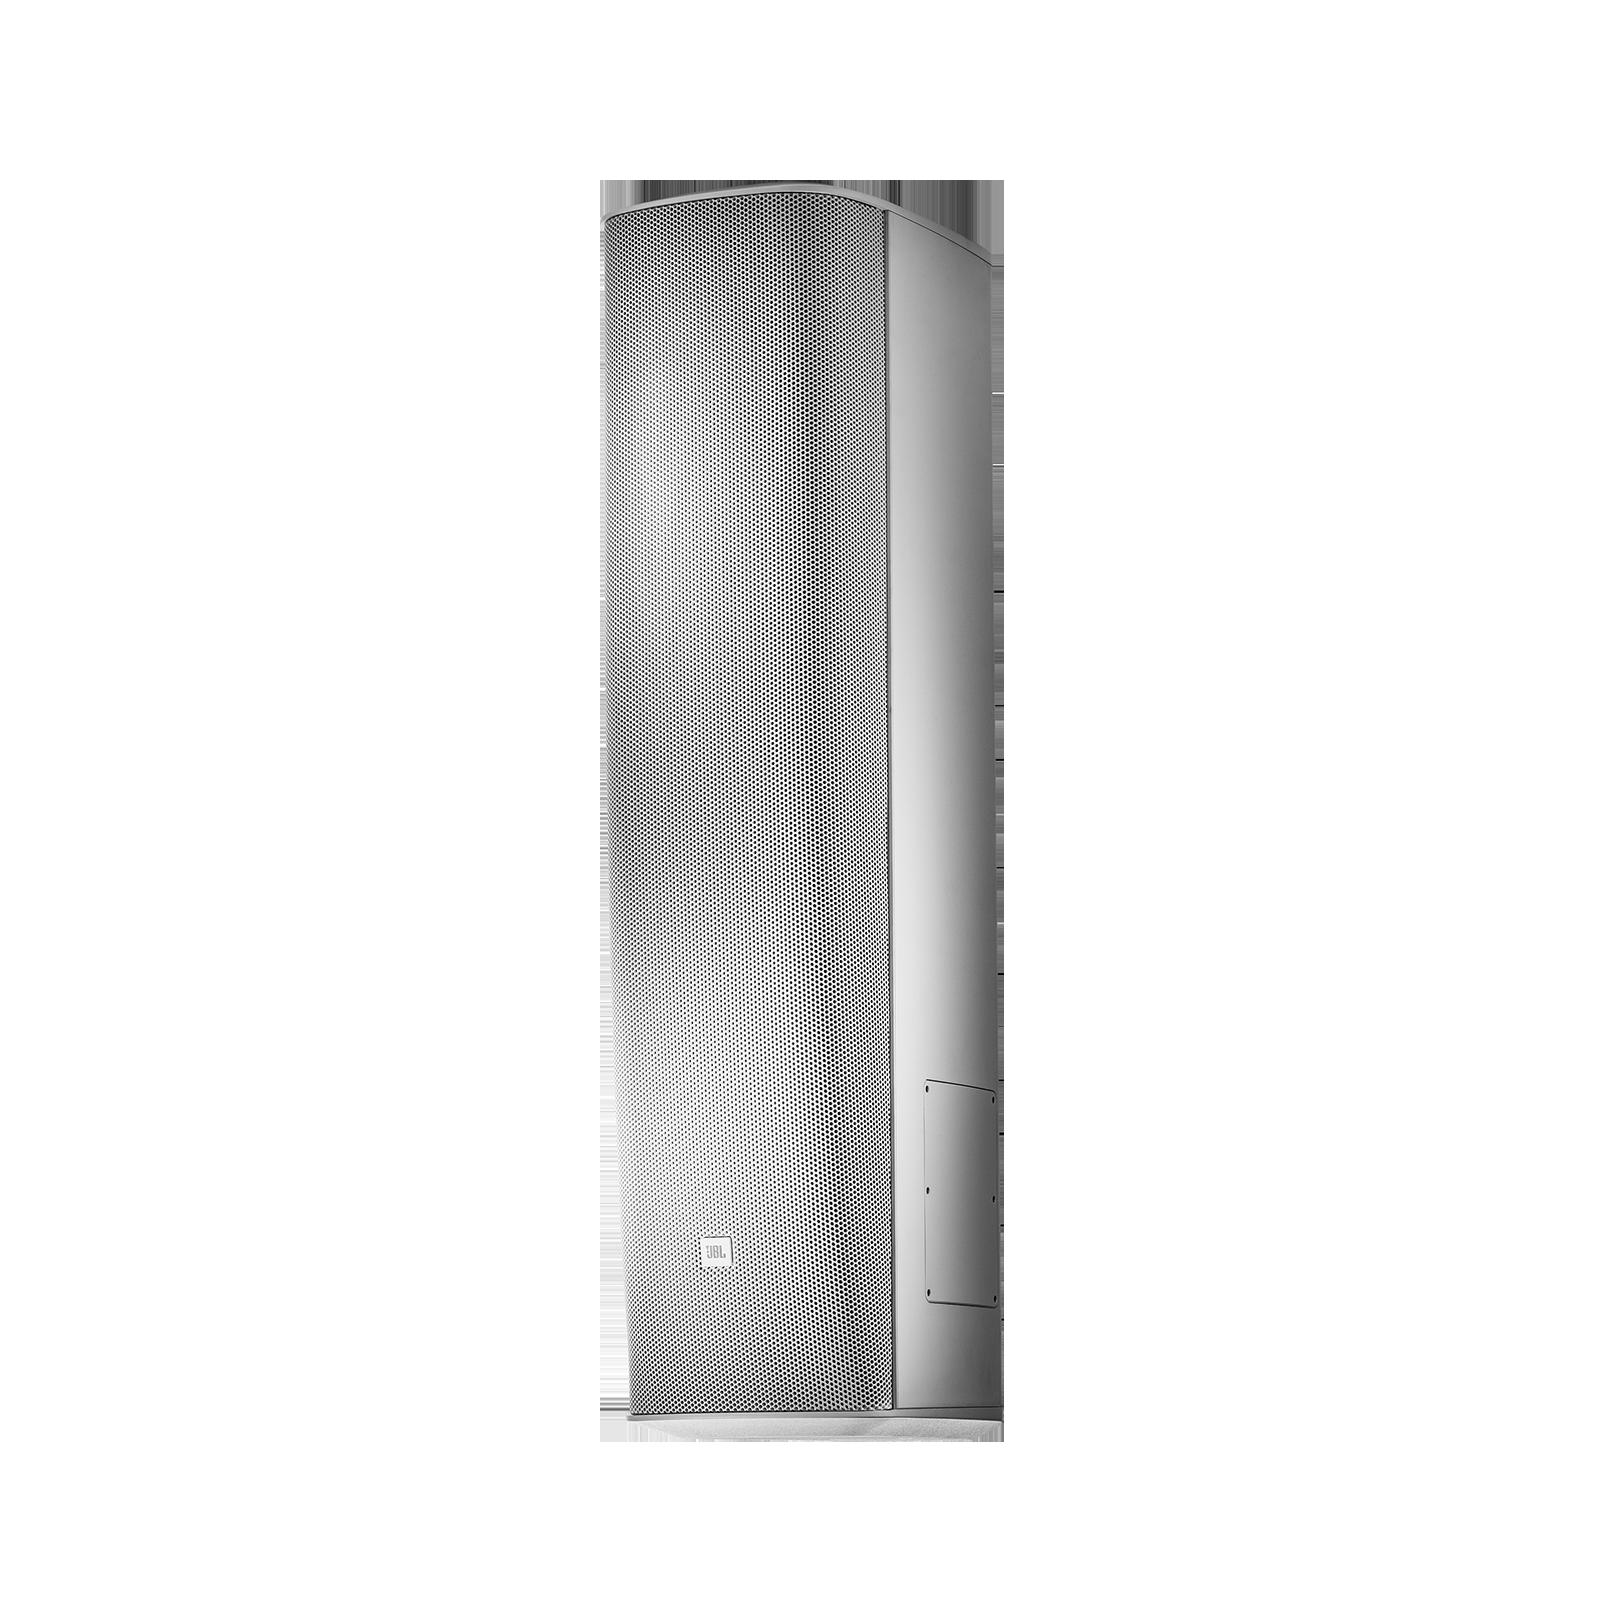 JBL CBT 1000 (B-Stock) - White - Constant Beamwidth Technology ™ Adjustable Coverage Line Array Column - Hero